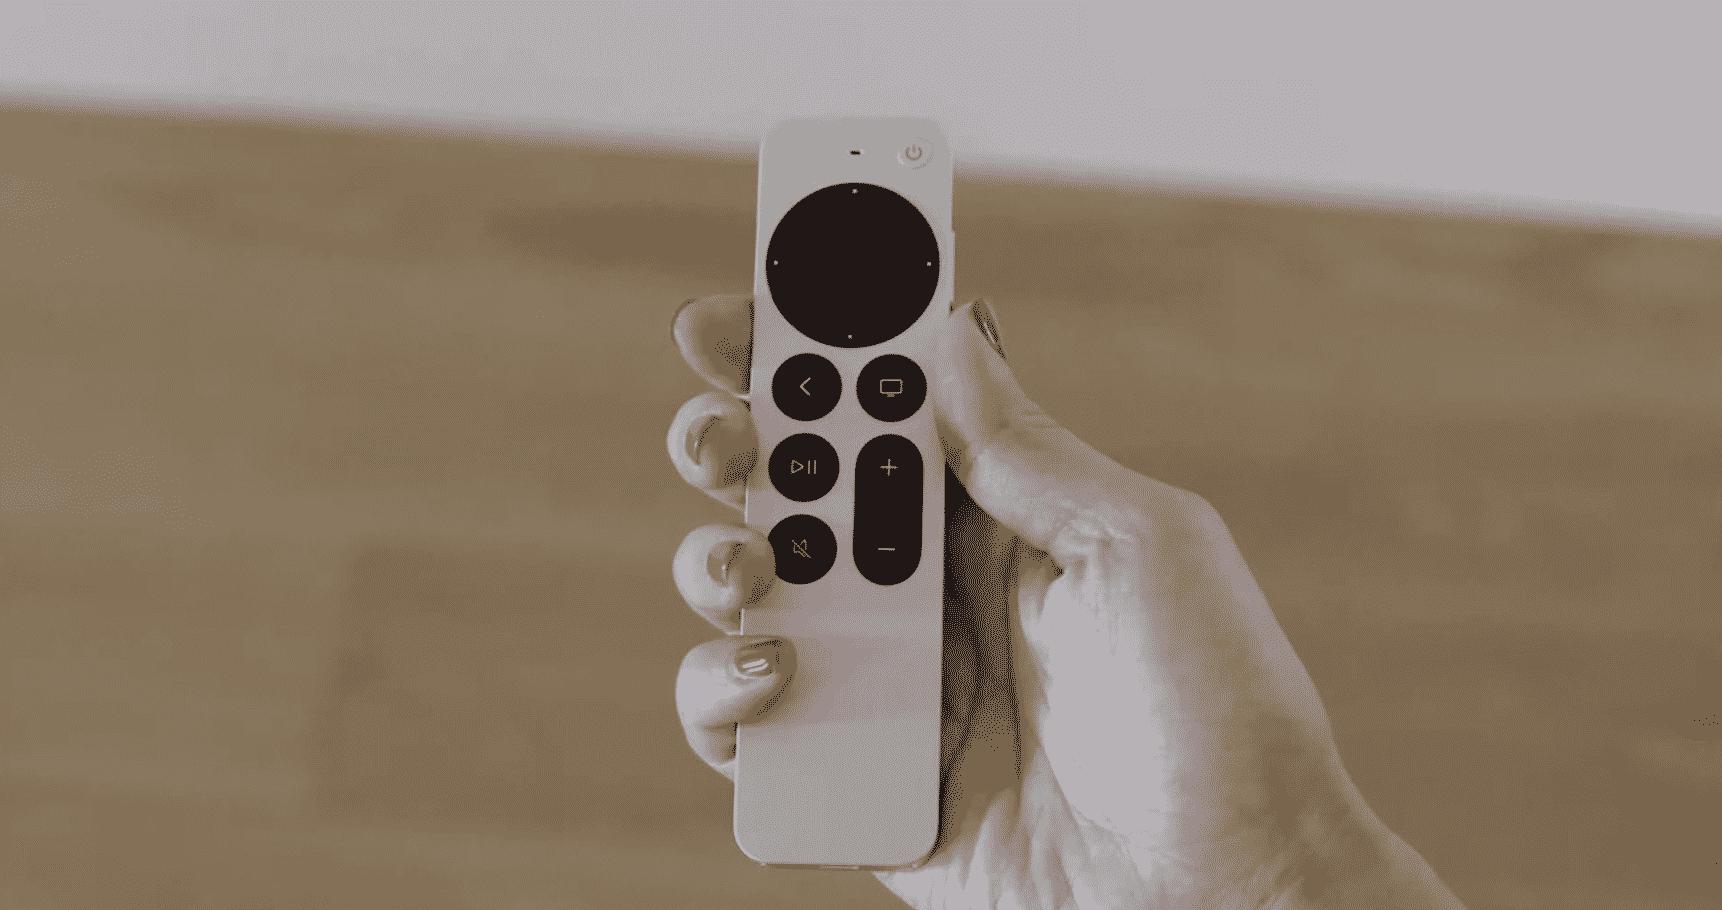 Apple TV 4K Remote